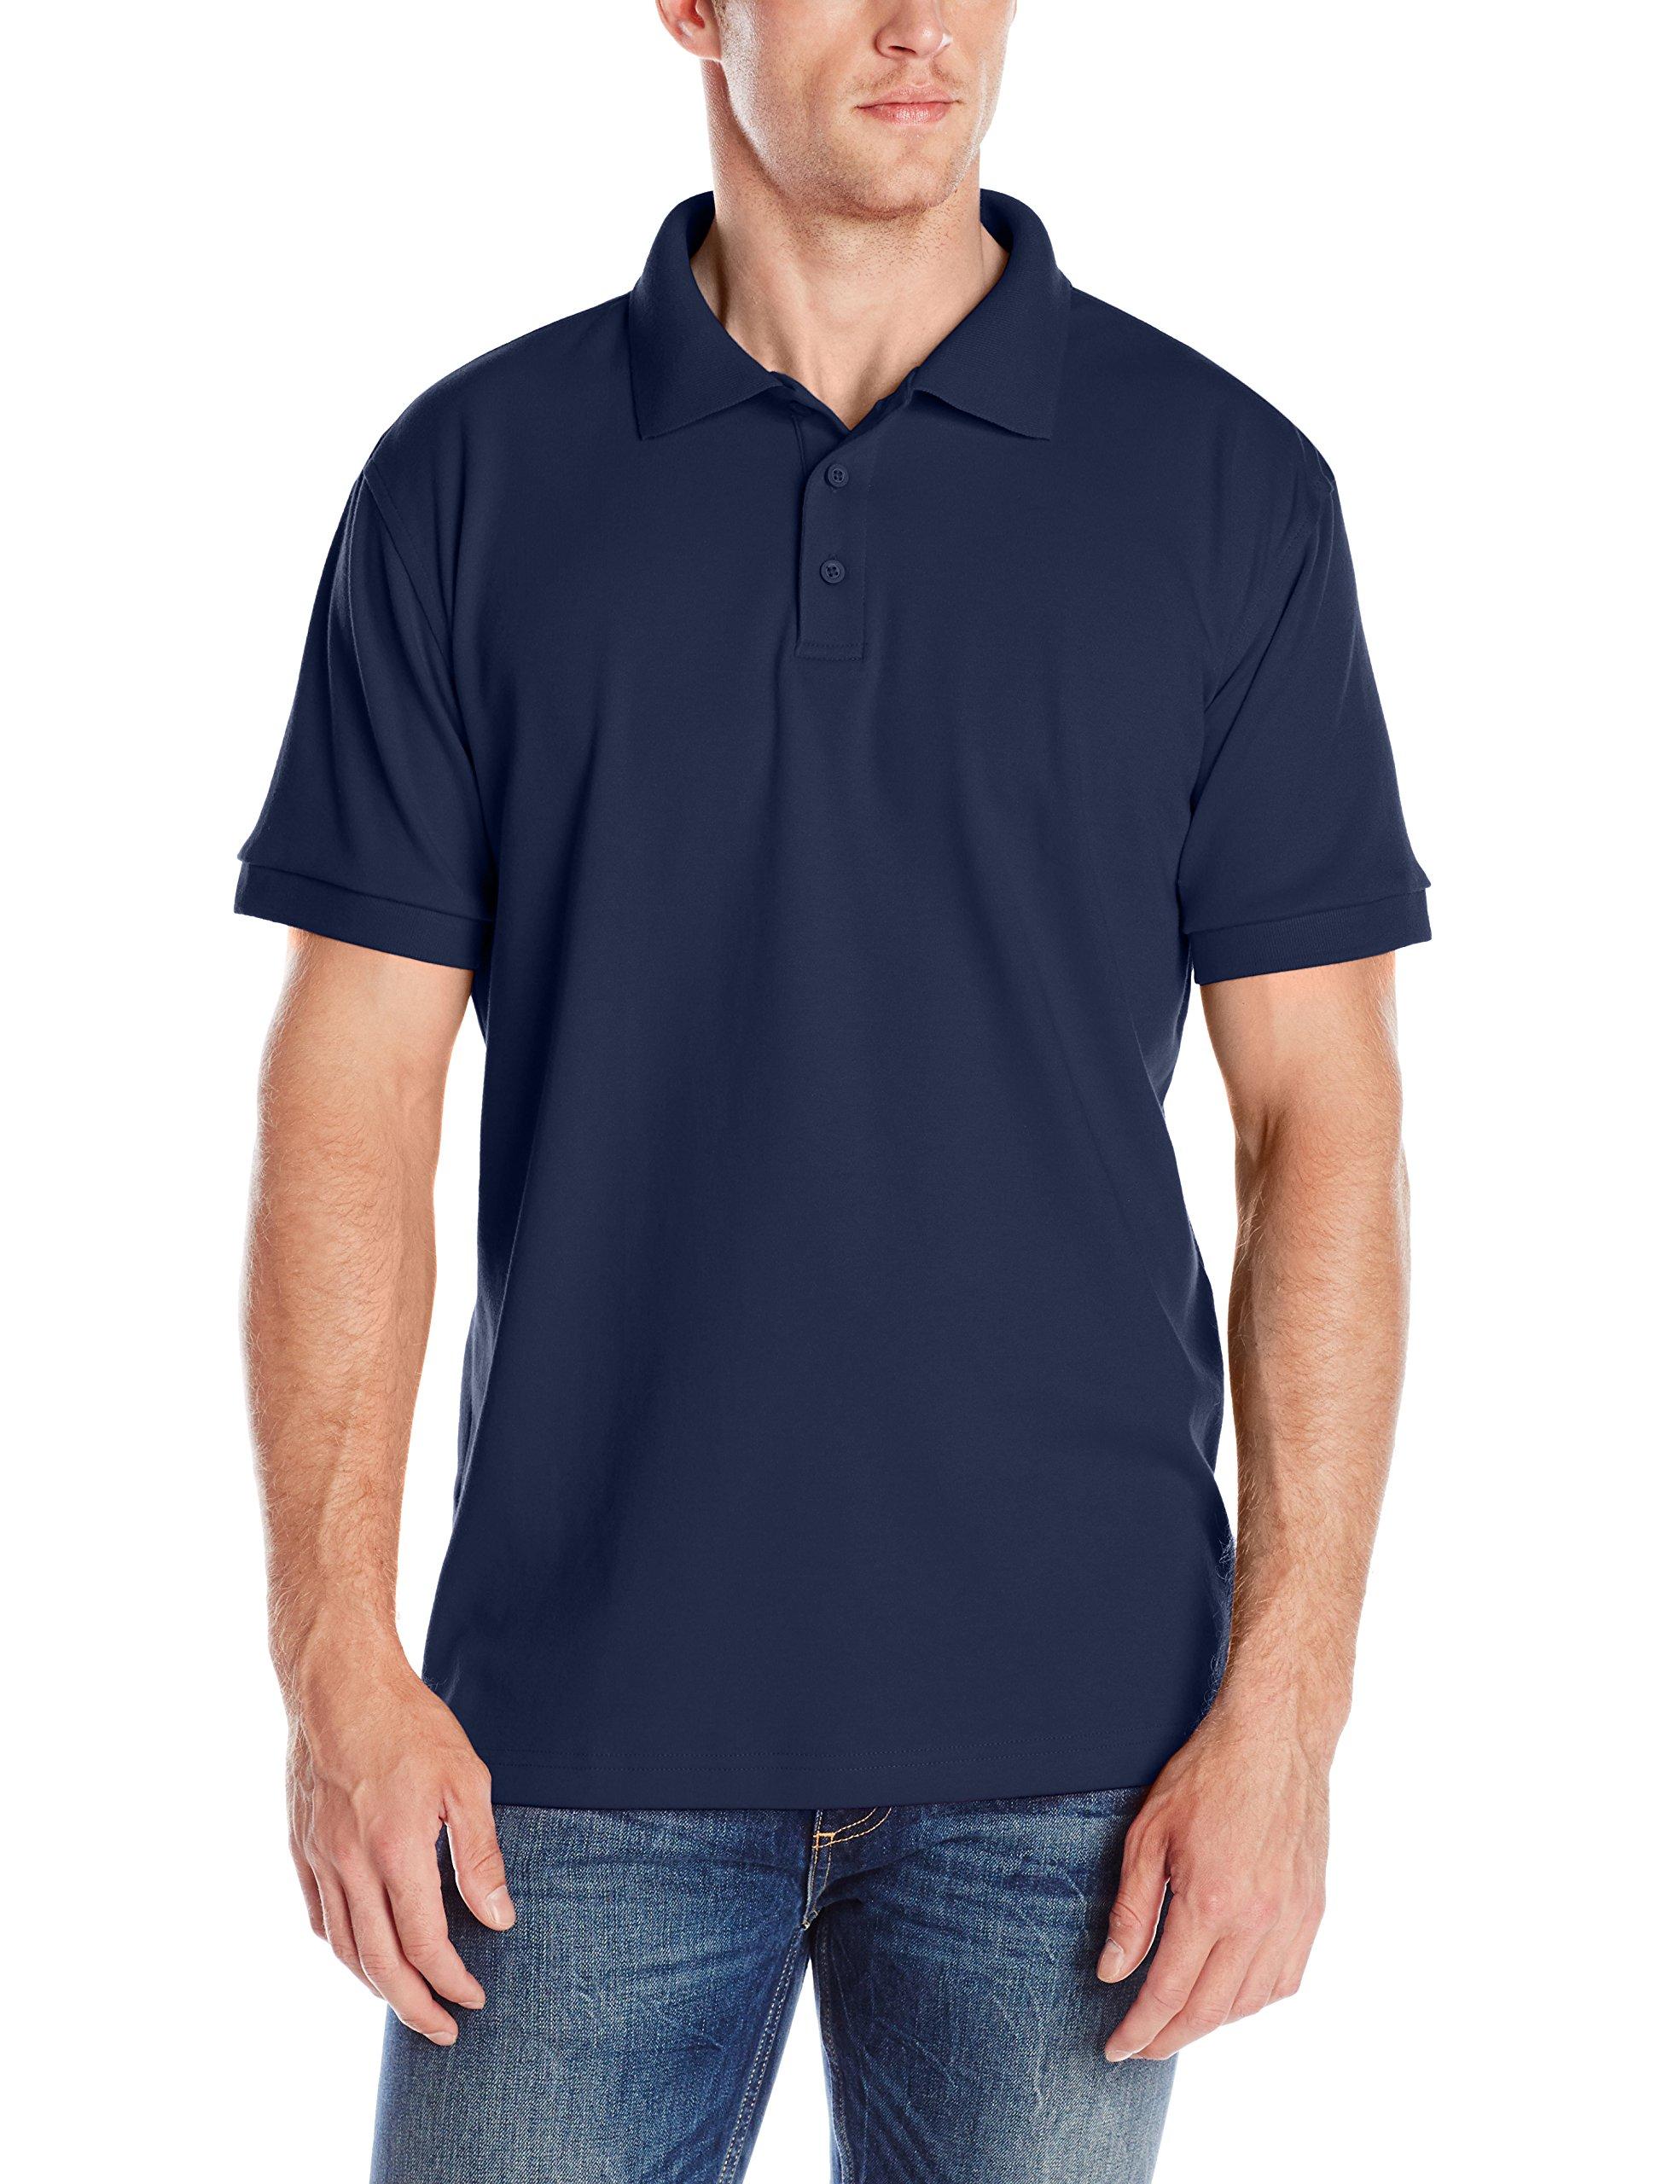 Classroom Men's Adult Unisex Short Sleeve Interlock Polo, Dark Navy, X-Large